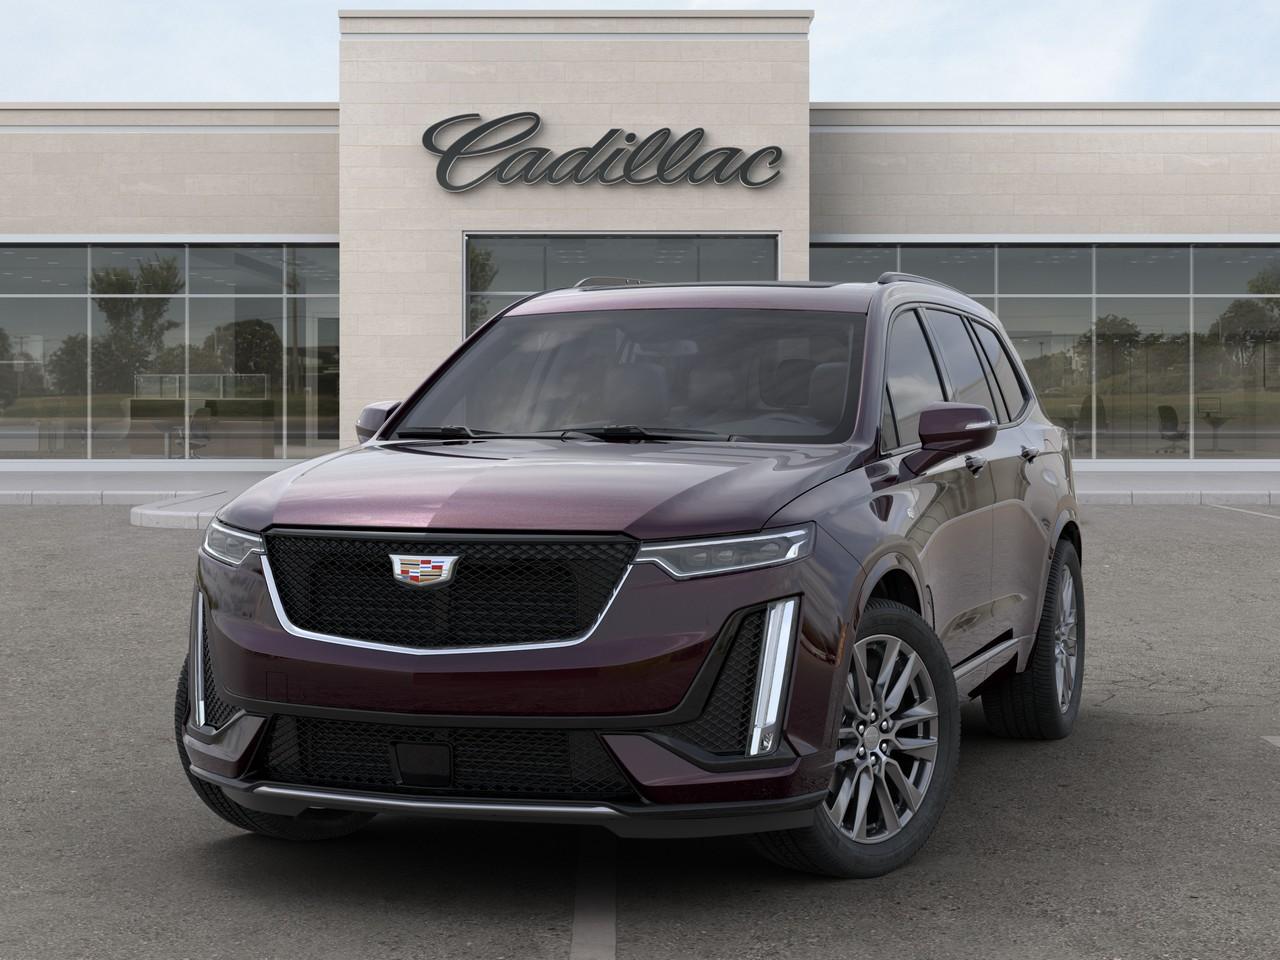 2020 CADILLAC XT6 Sport Crossover